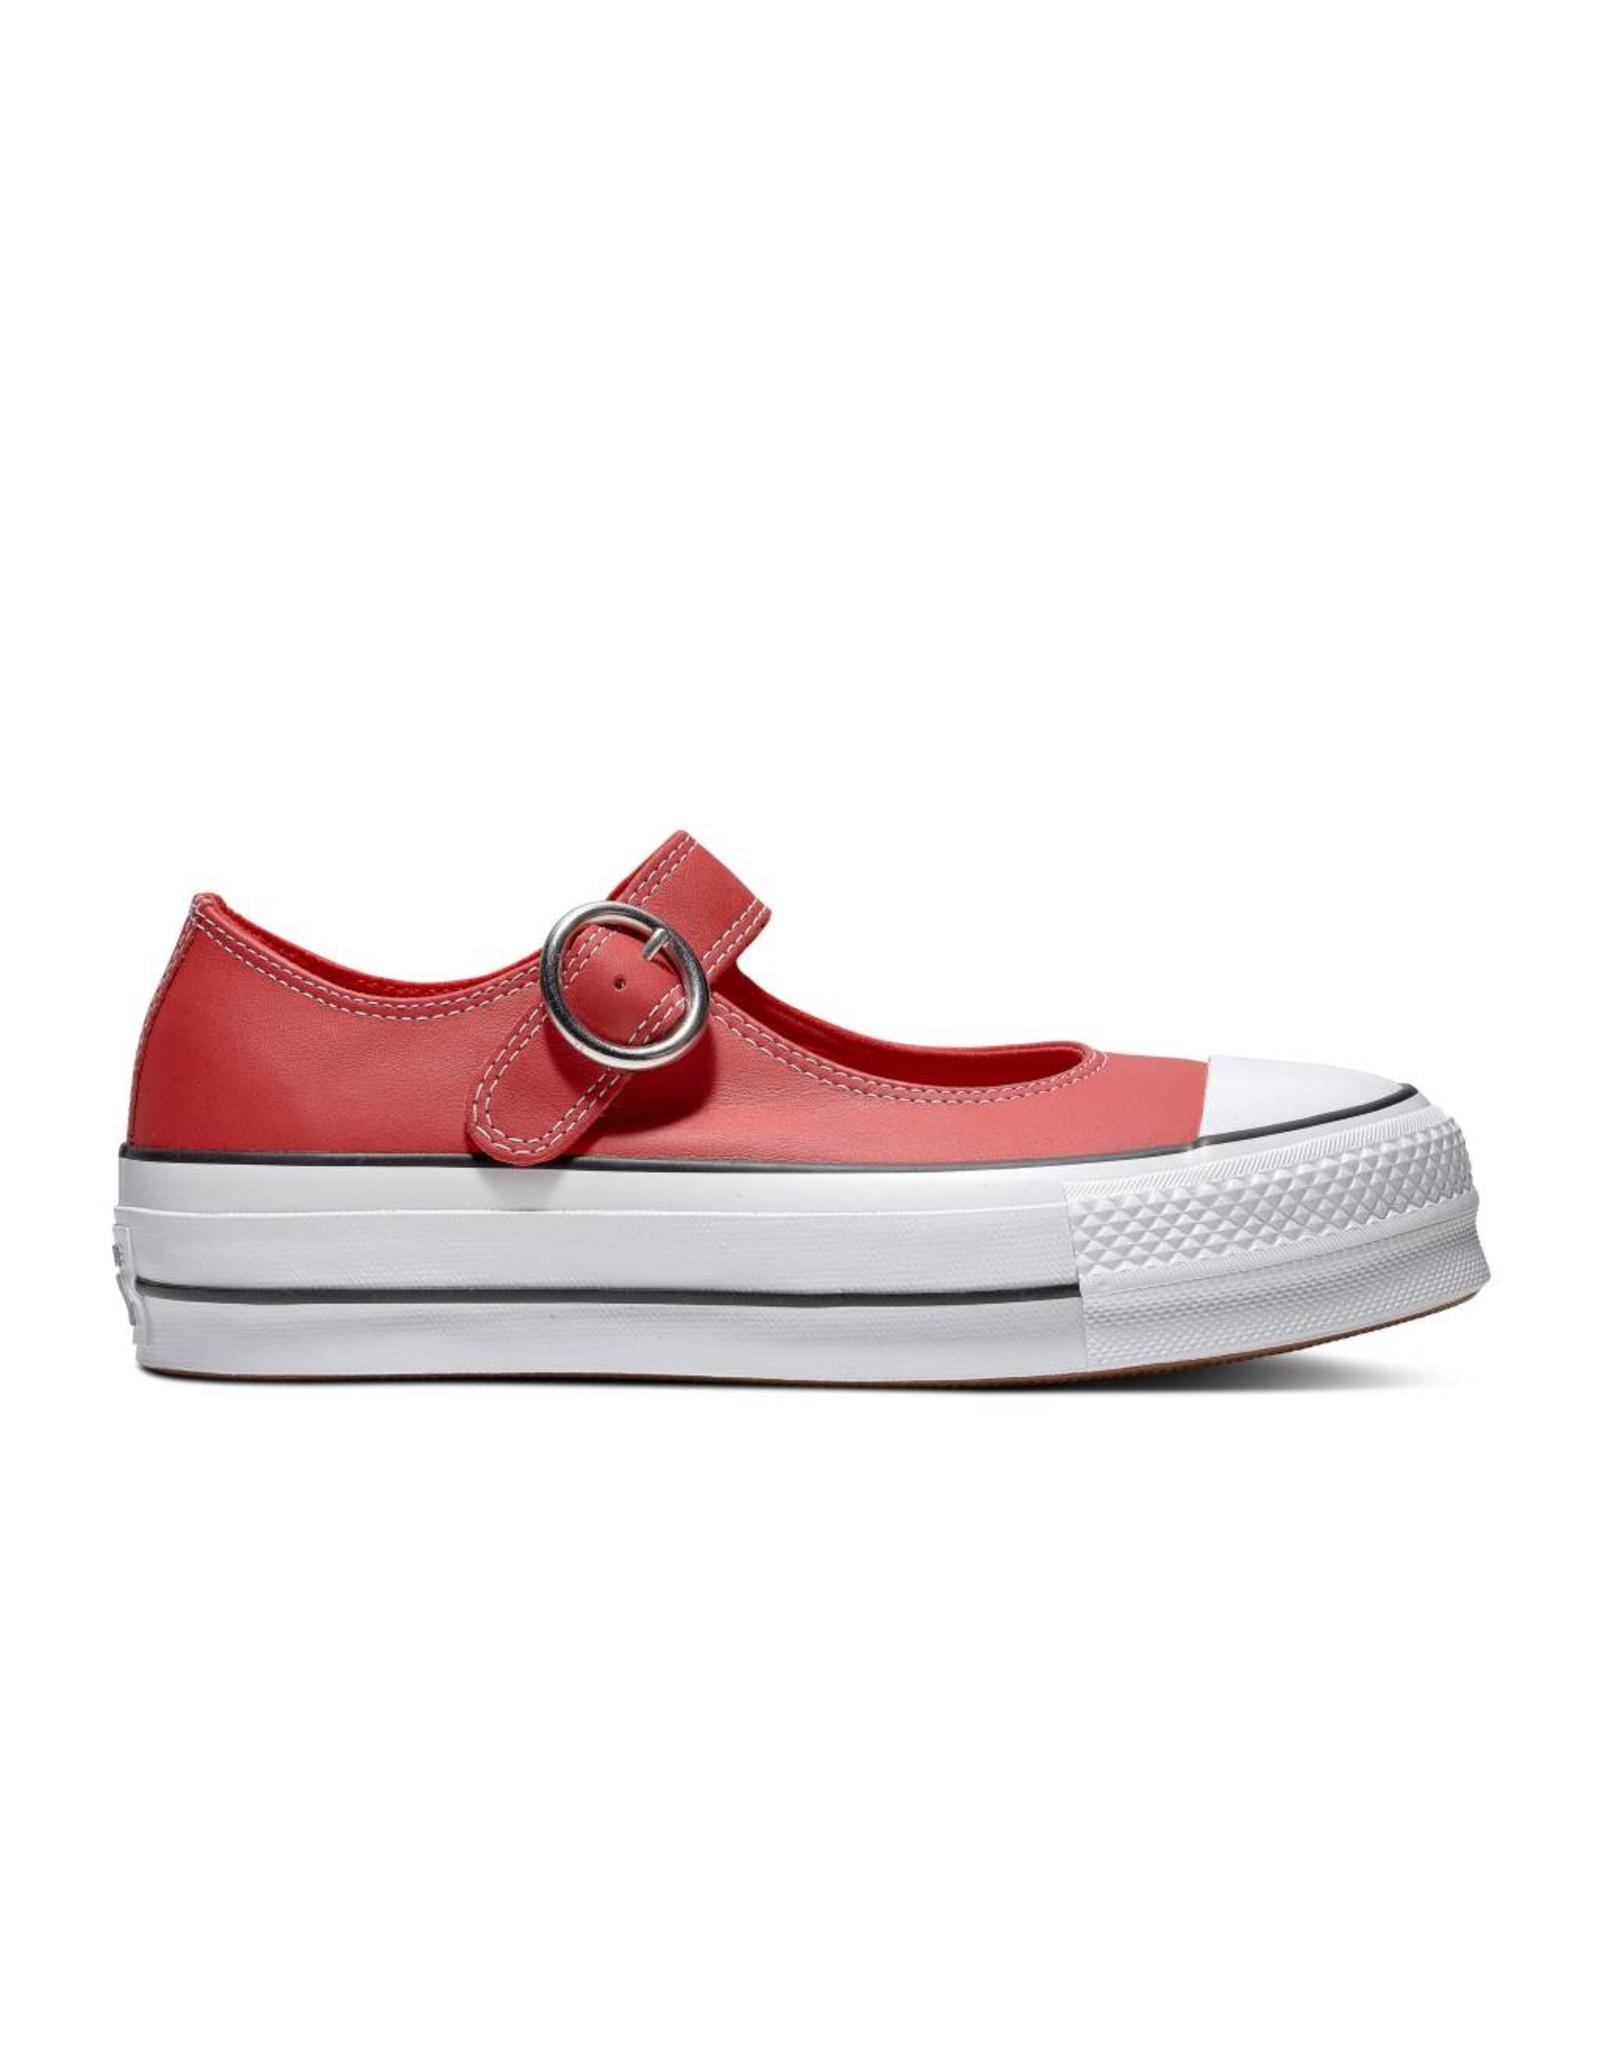 CONVERSE CHUCK TAYLOR ALL STAR MARY JANE OX ENAMEL CUIR RED/BLACK/WHITE C13MJR-563502C